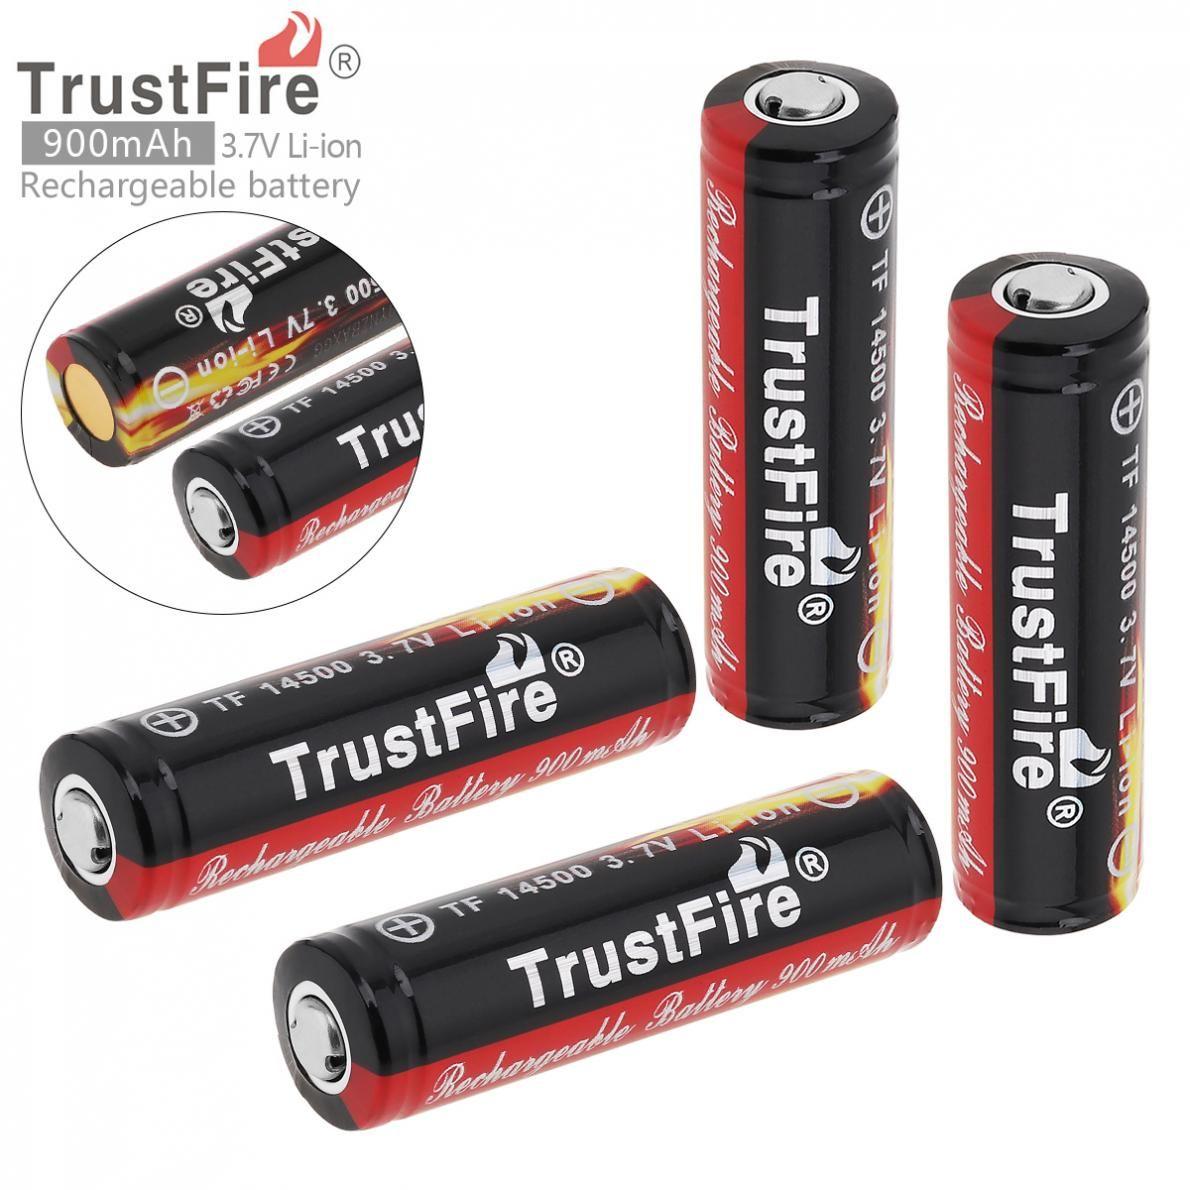 4 Pieces/set TrstFire <font><b>14500</b></font> Battery 3.7V ICR14500 900Mah Li-ion Rechargeable Battery Batteries Bateria For LED Flashlight